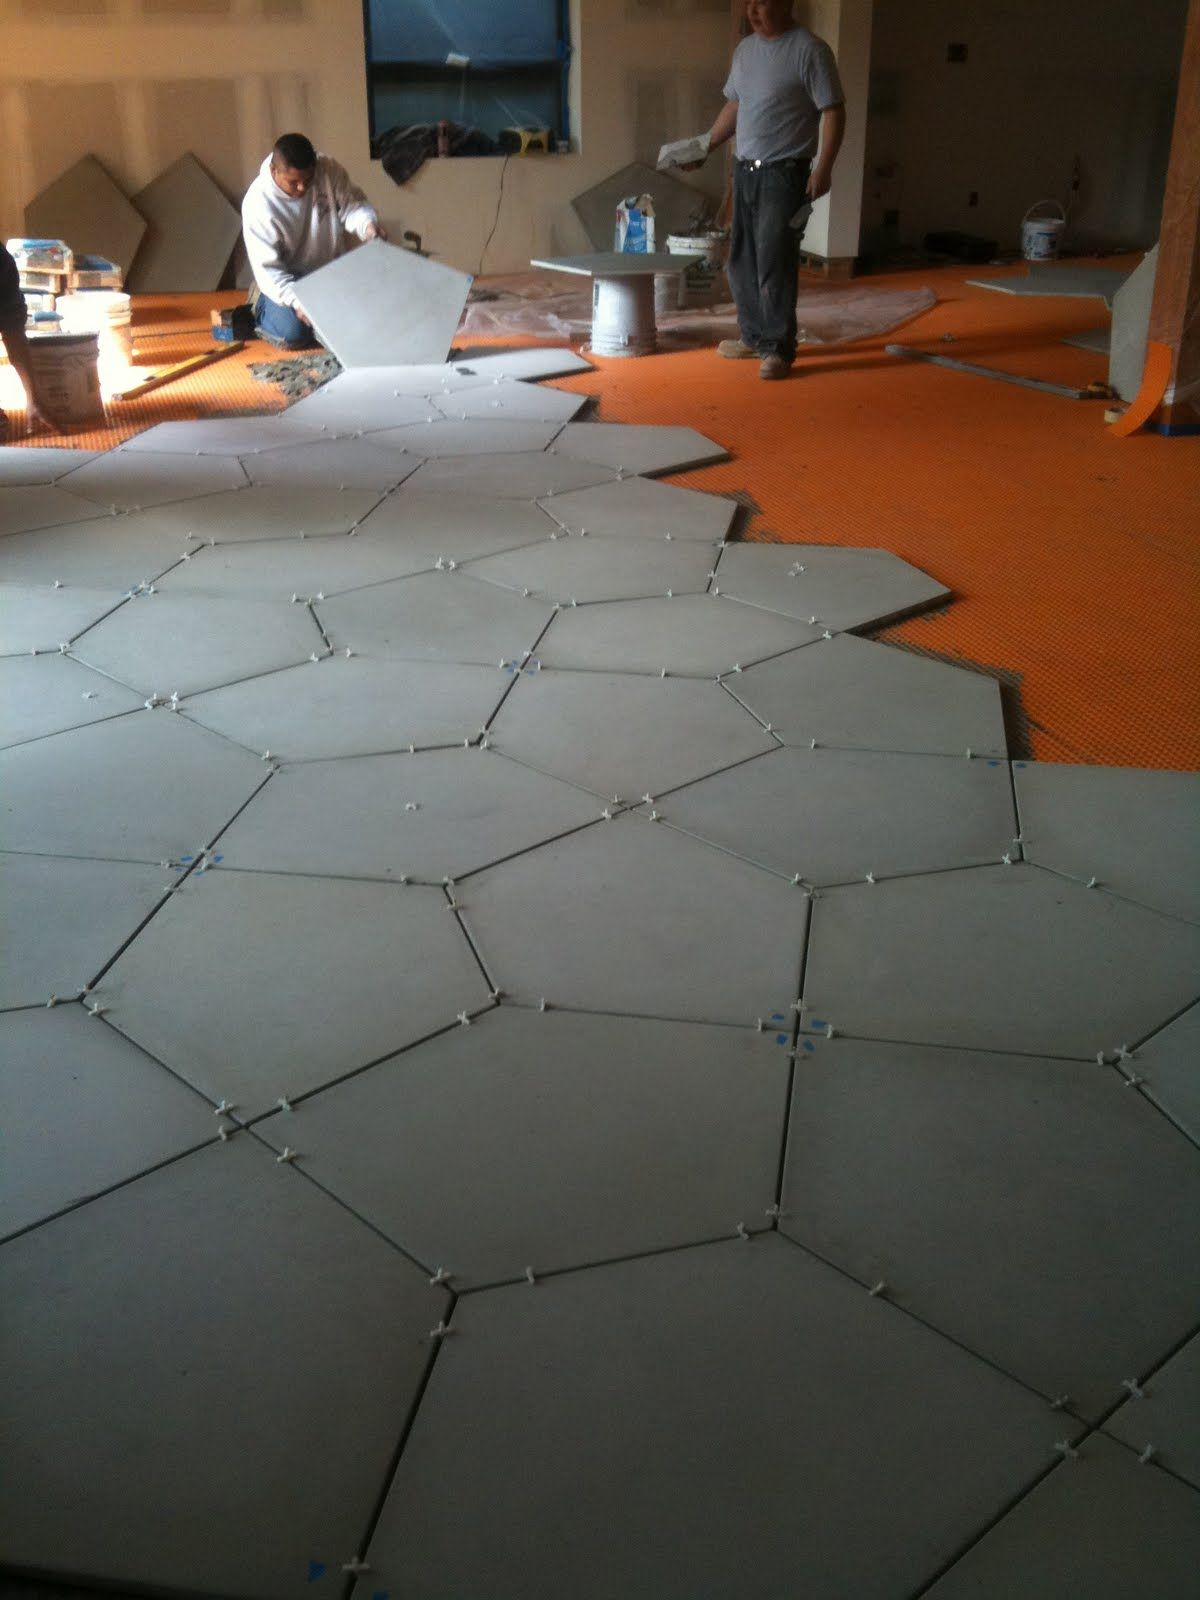 Custom Gfrc Concrete Tiles Are Now